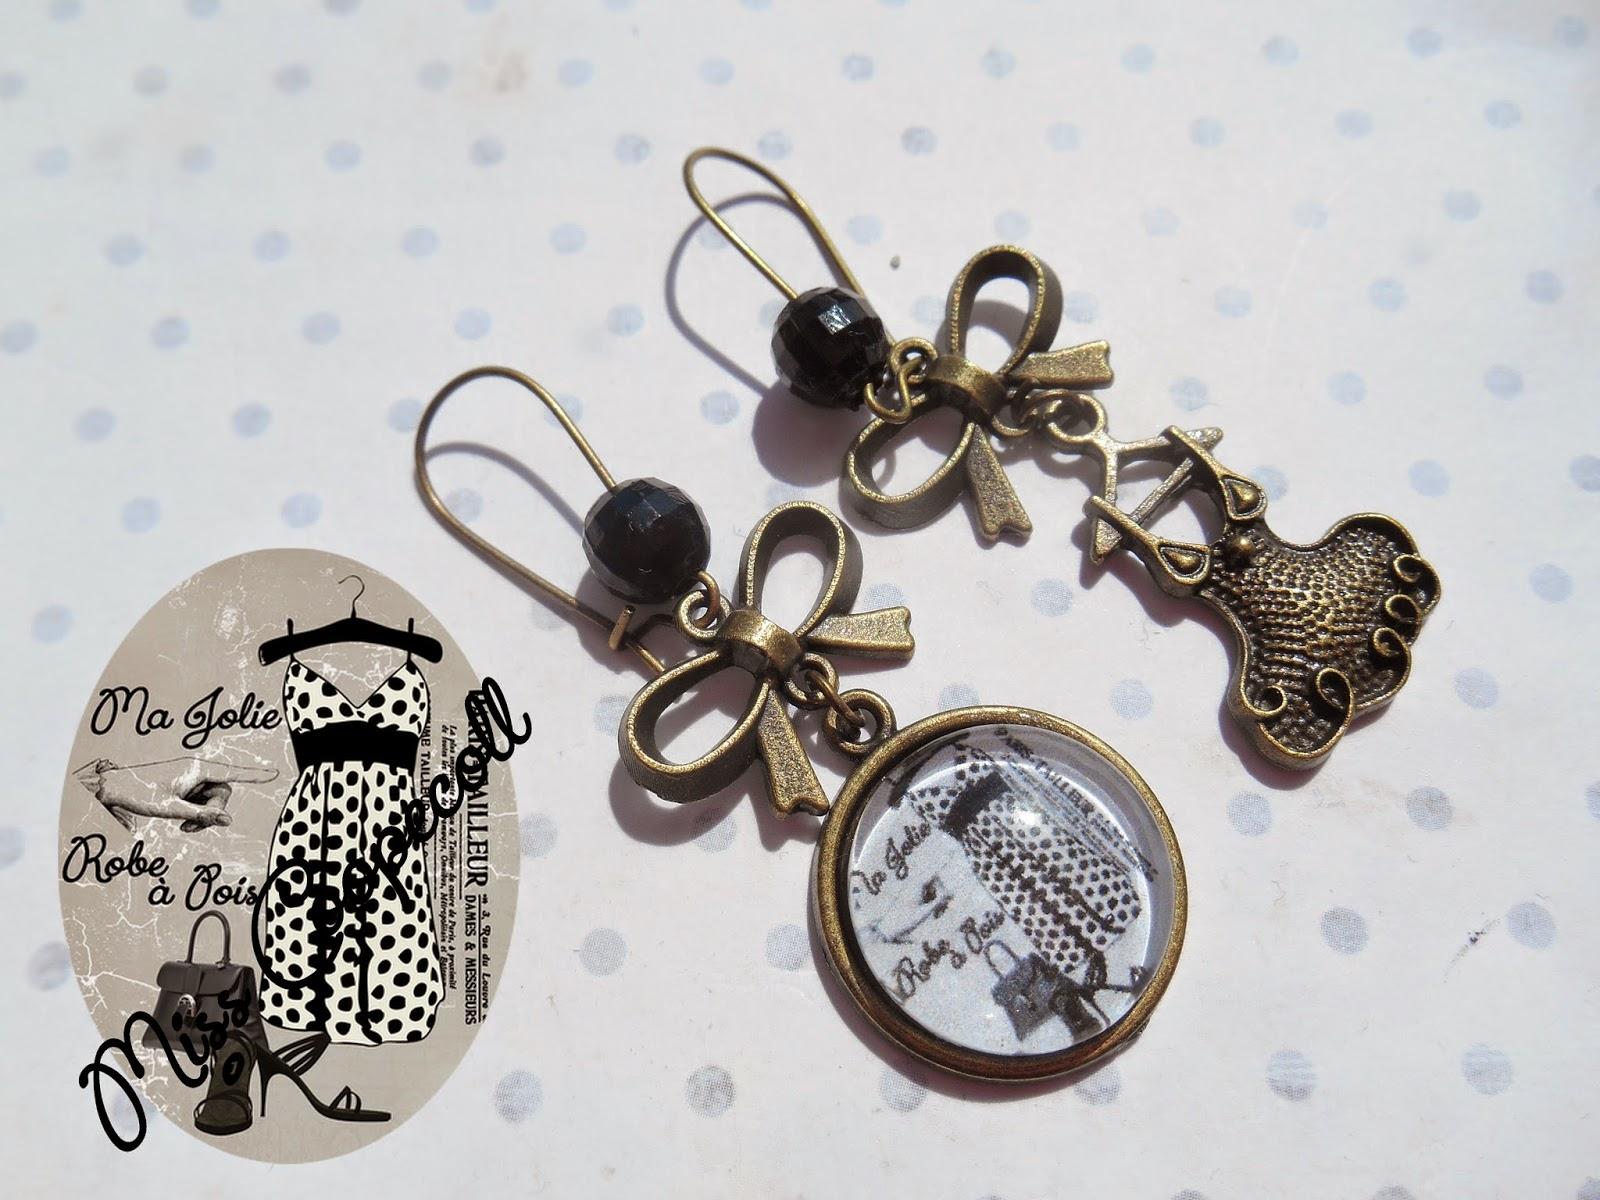 http://www.alittlemarket.com/boucles-d-oreille/fr_grandes_boucles_d_oreilles_dormeuses_vintage_ma_jolie_robe_a_pois_creation_miss_coopecoll_-10985983.html